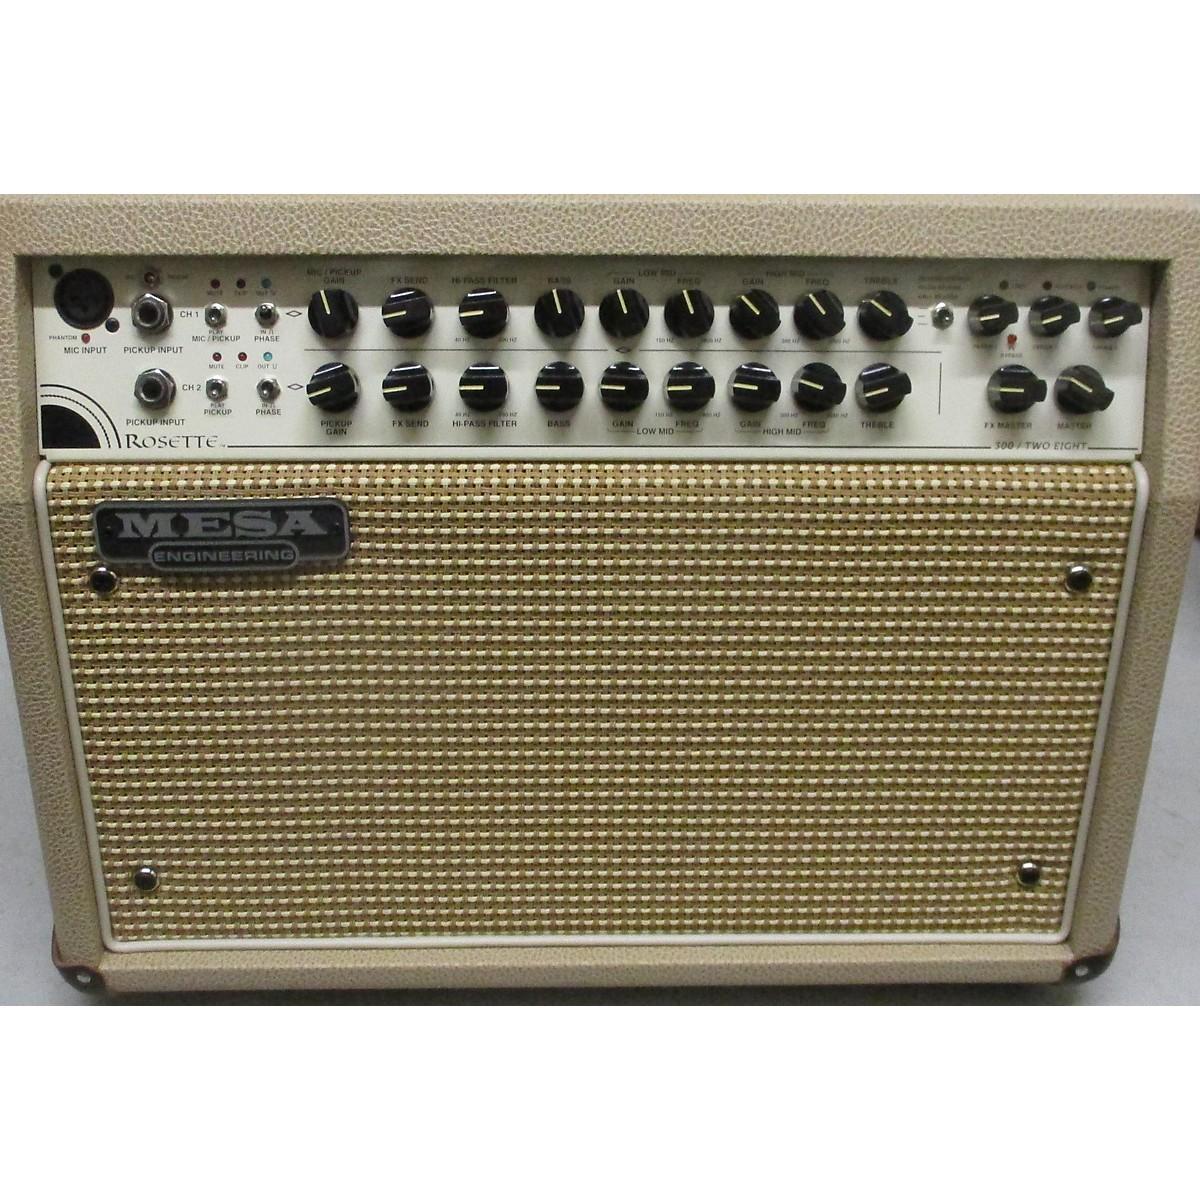 Mesa Boogie Rosette 300 Acoustic Guitar Combo Amp